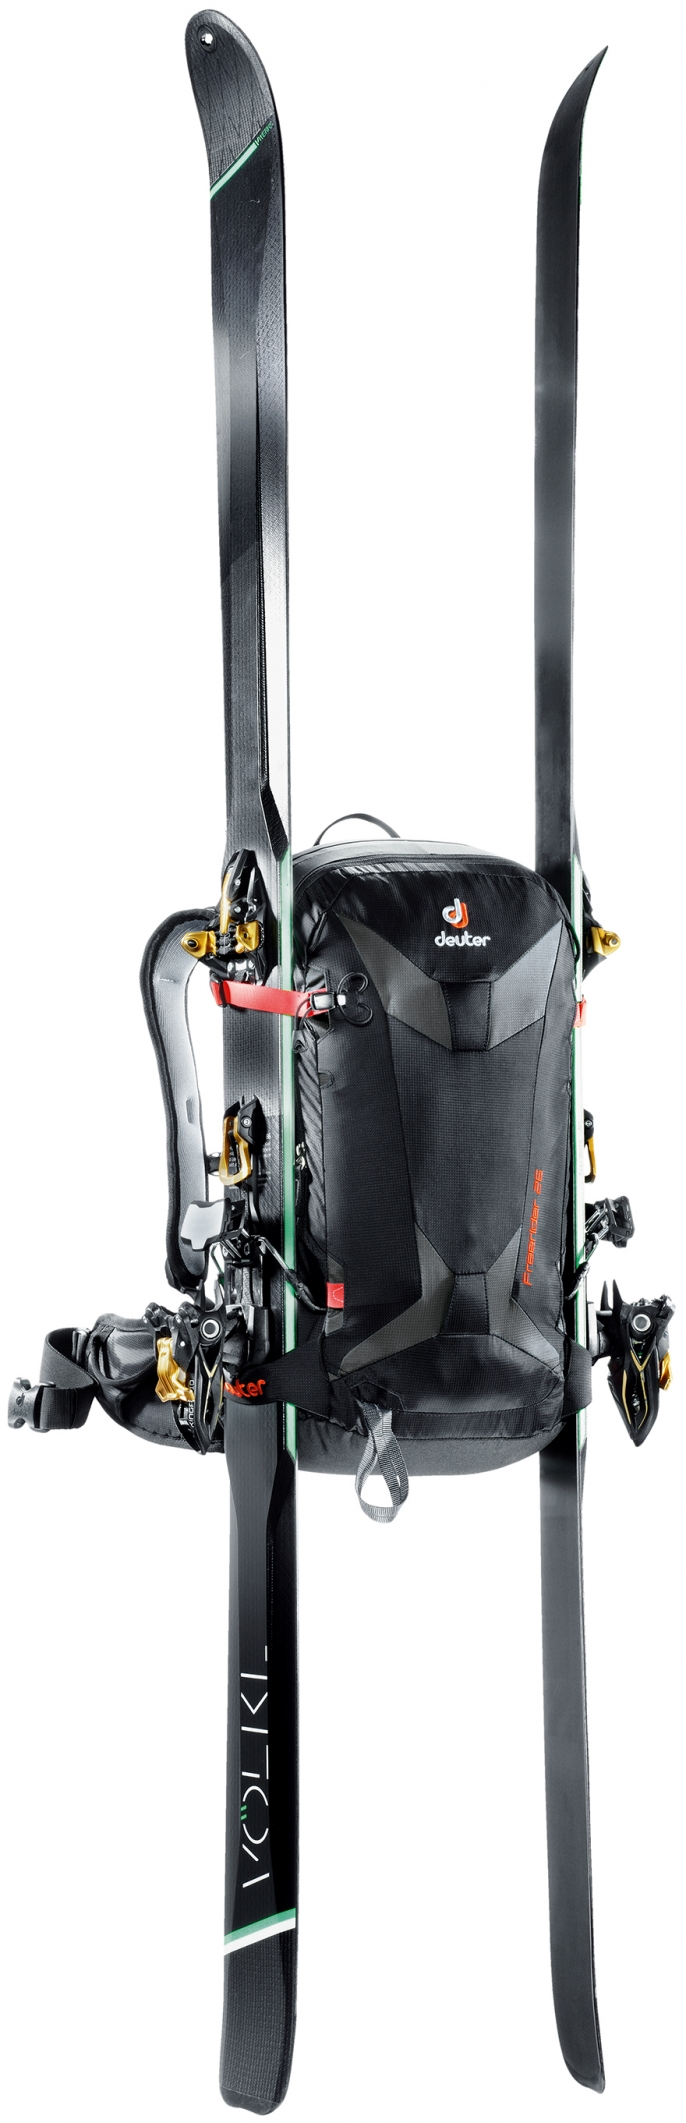 FREERIDER 24 SLp-m-ski